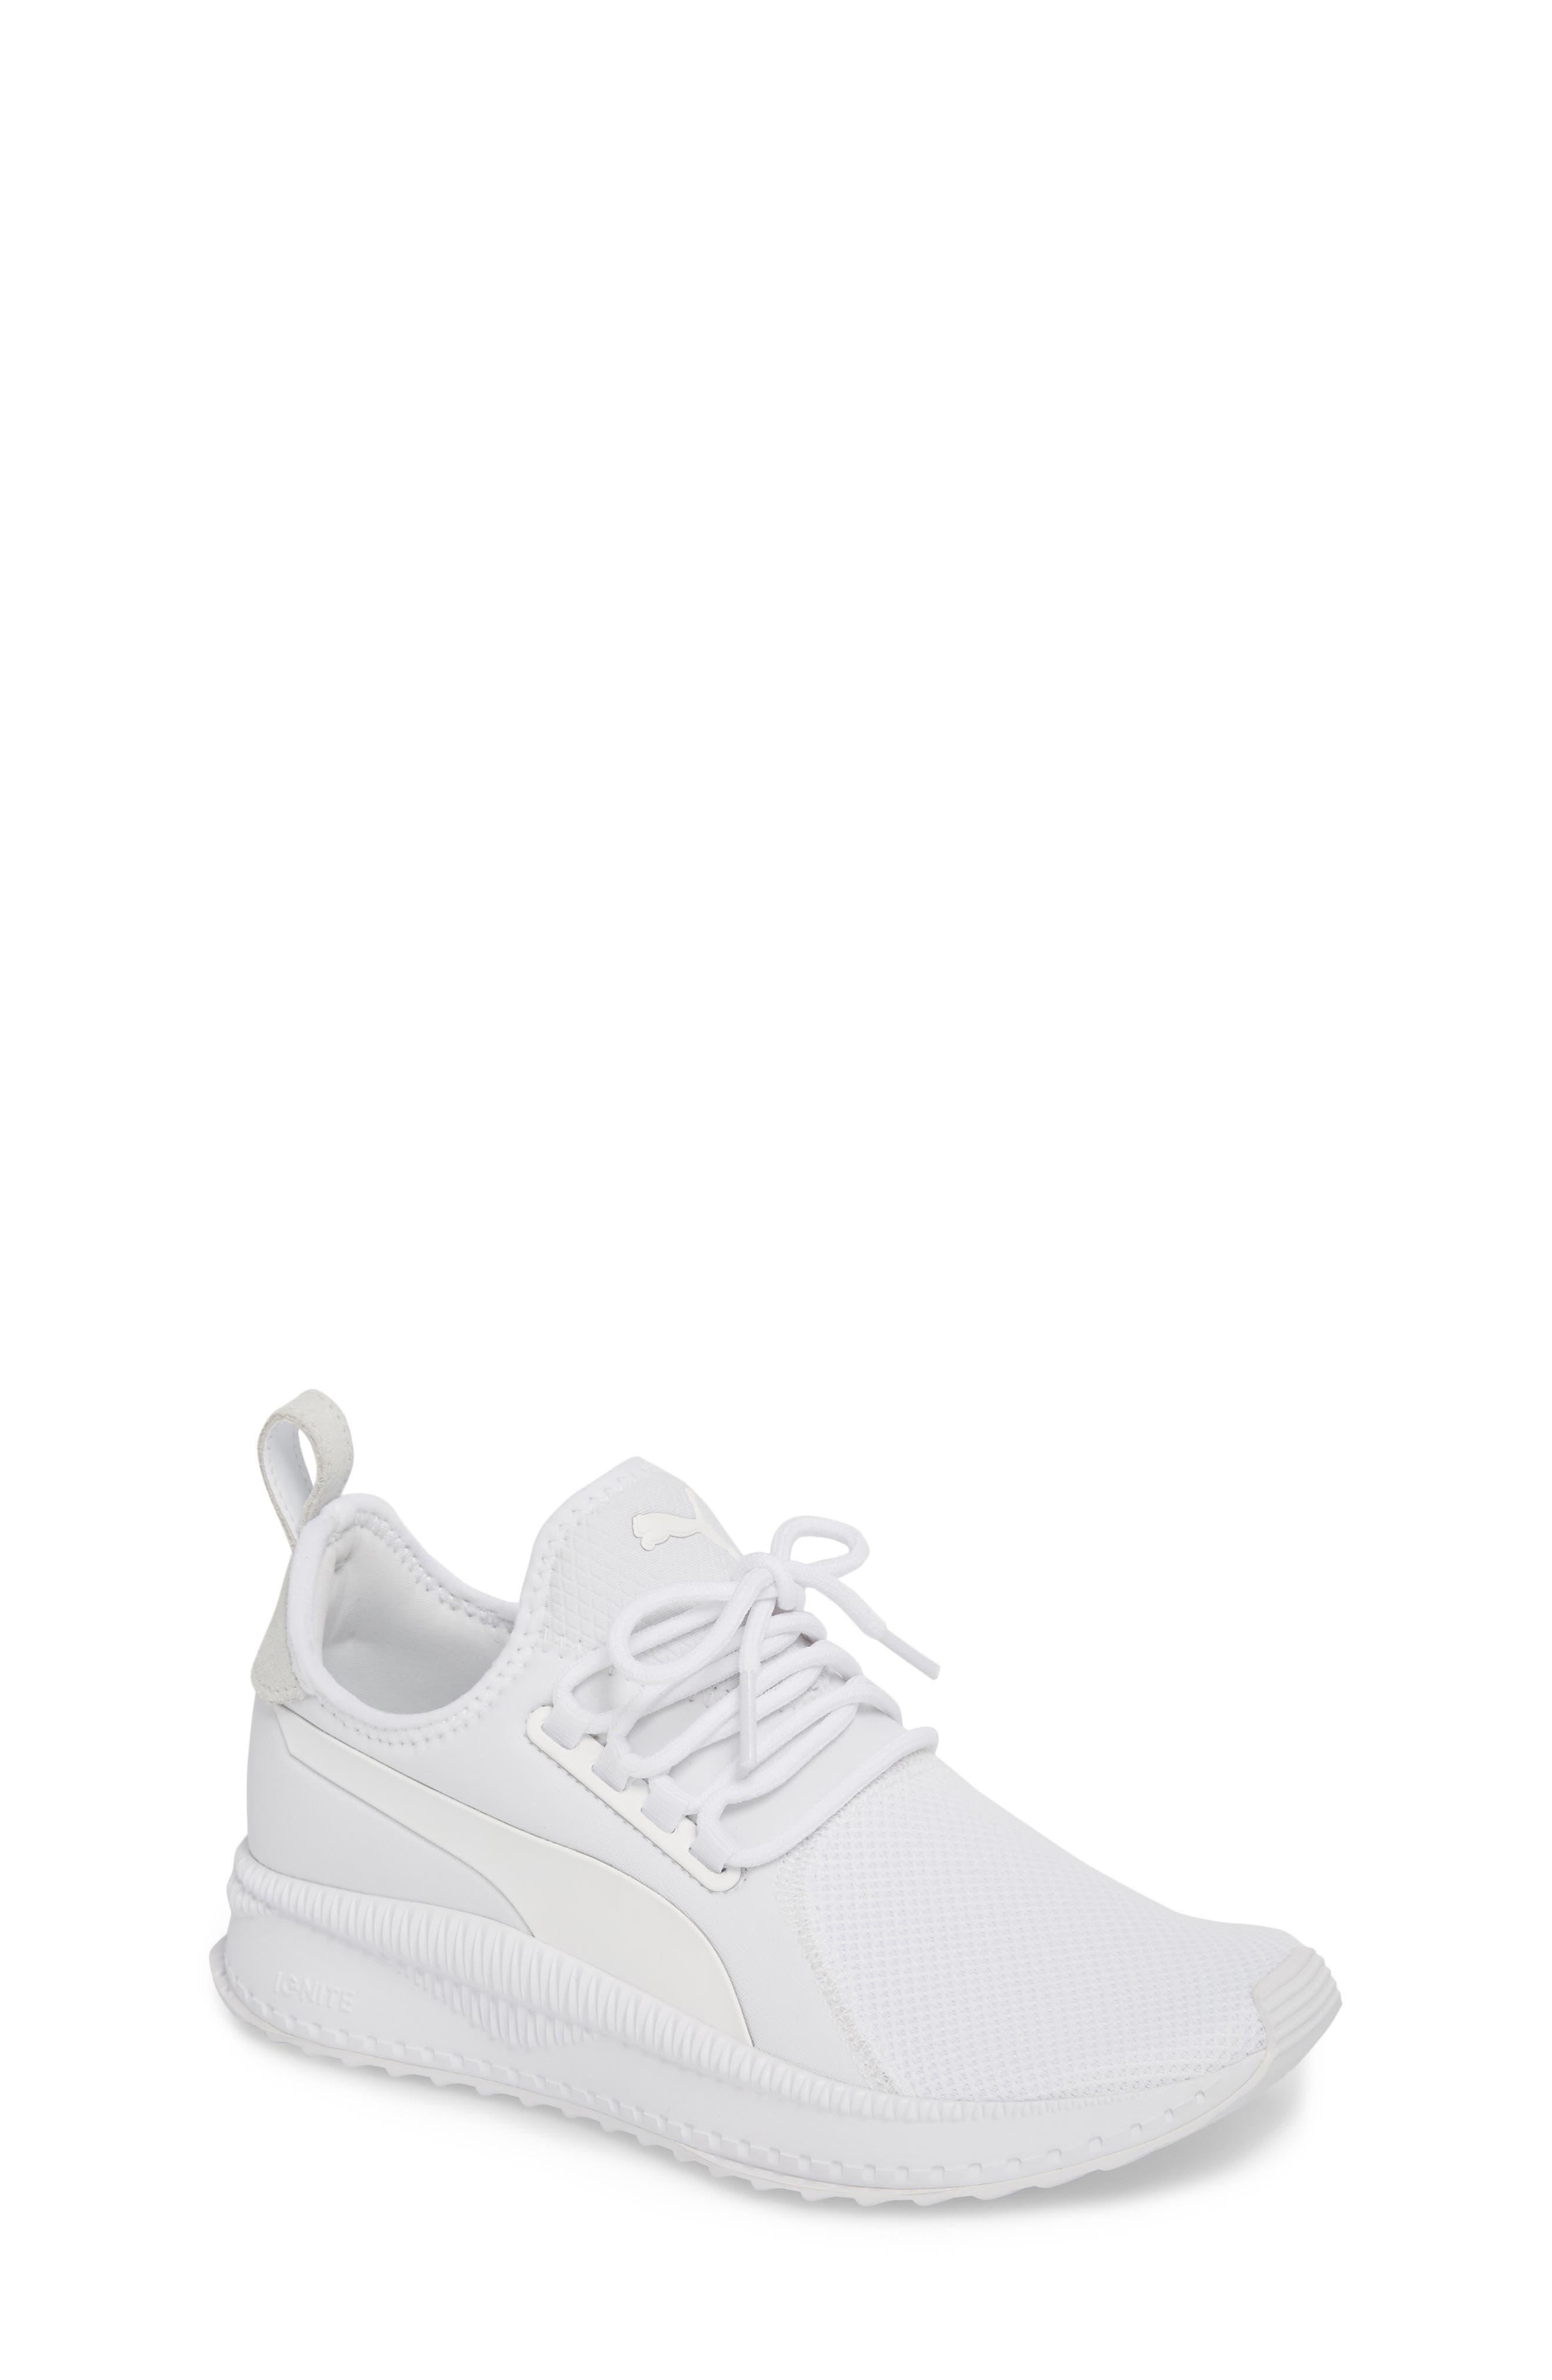 Tsugi Apex Sneaker,                             Main thumbnail 1, color,                             White/ White